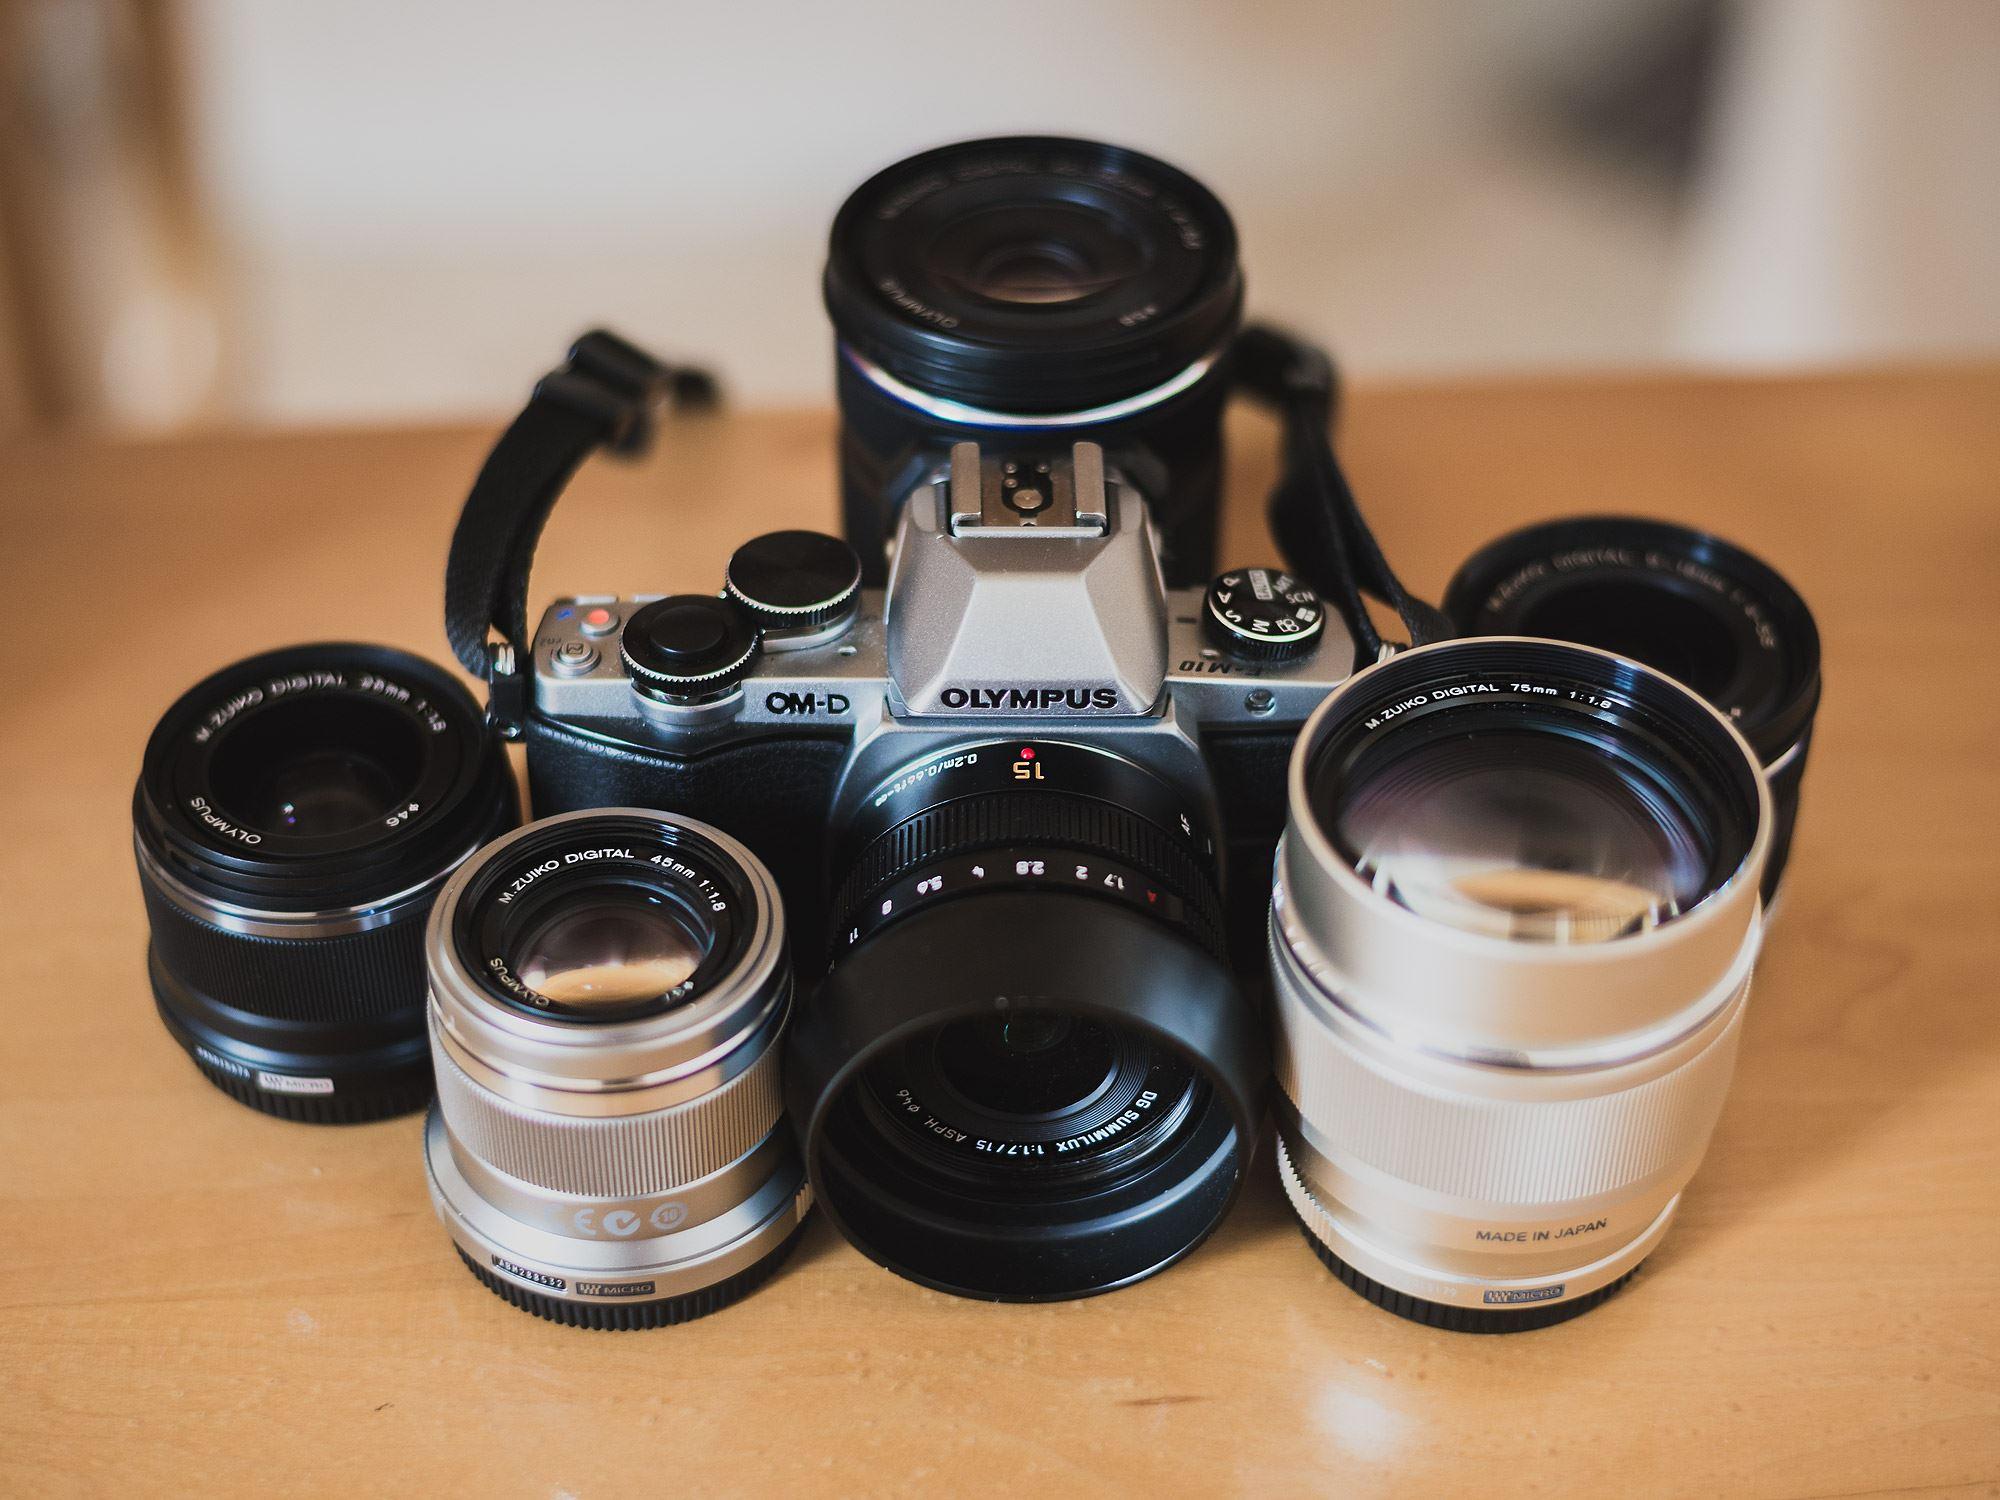 My Olympus OMD EM10 mirrorless camera kit.